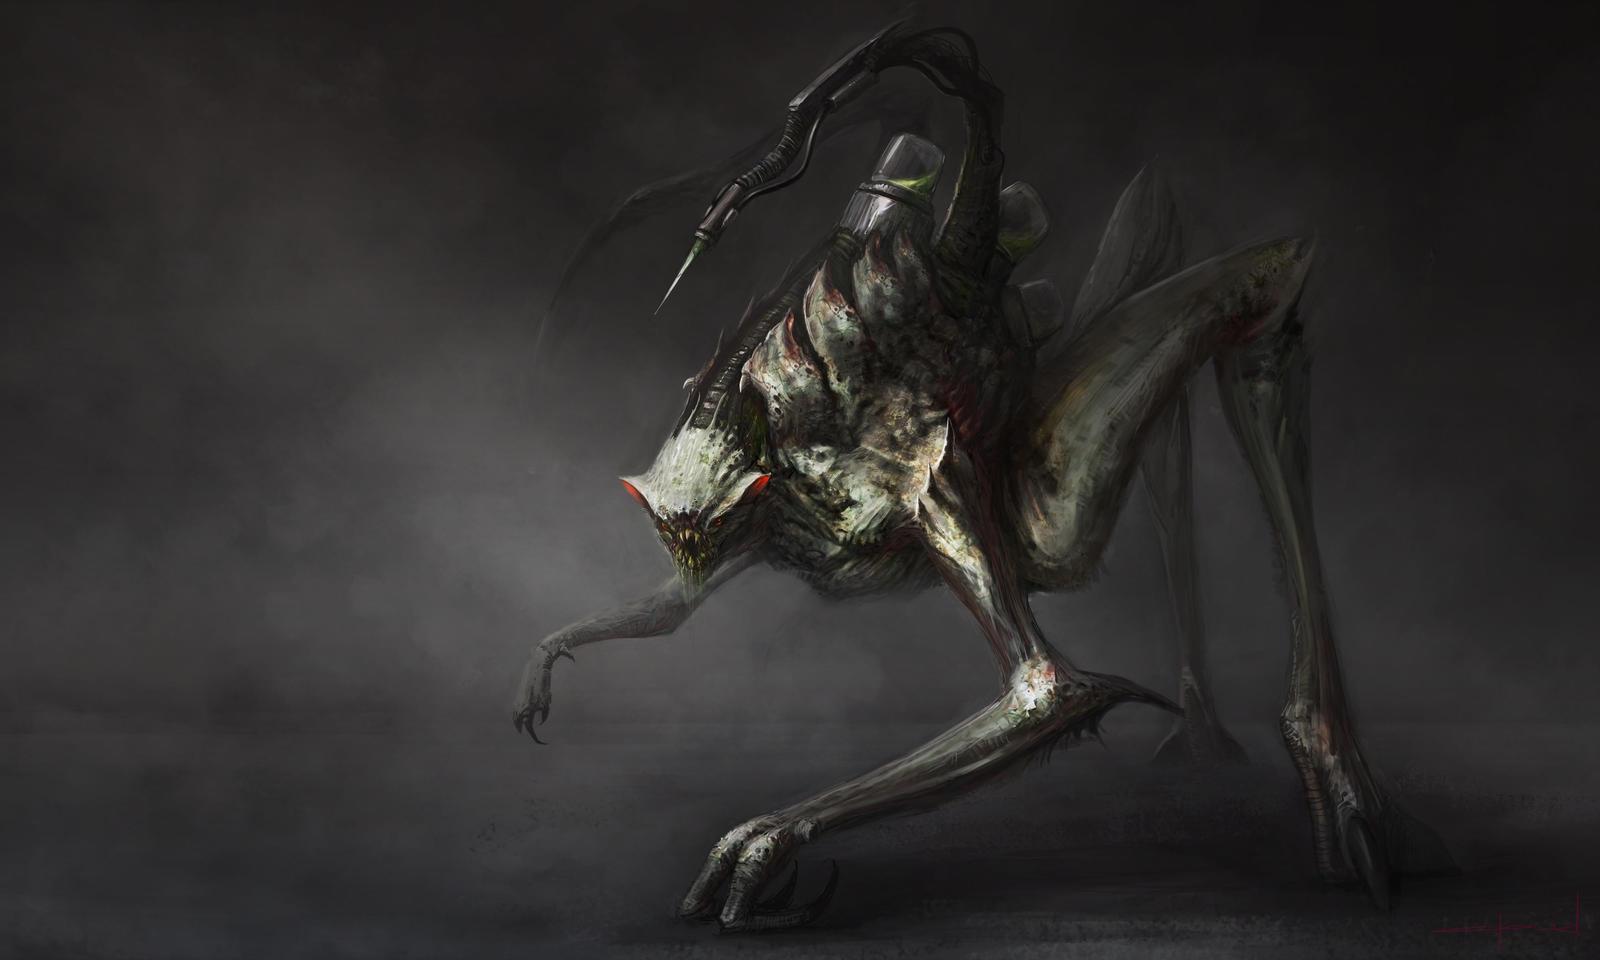 Thermoreceptor by Darkcloud013